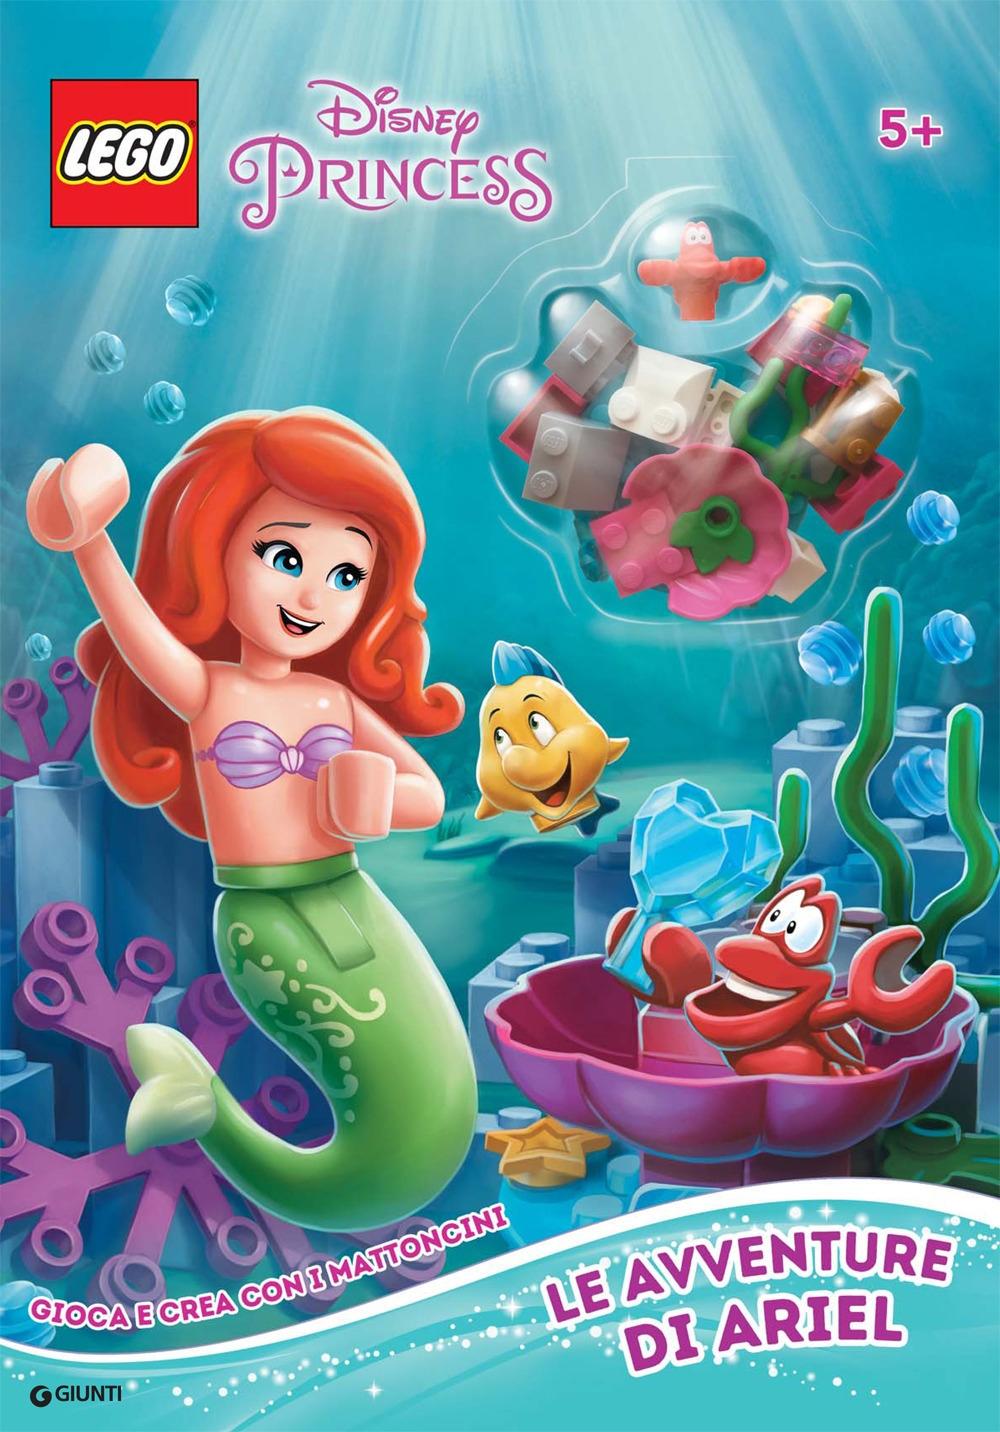 Le avventure di Ariel. Principesse Lego. Super album